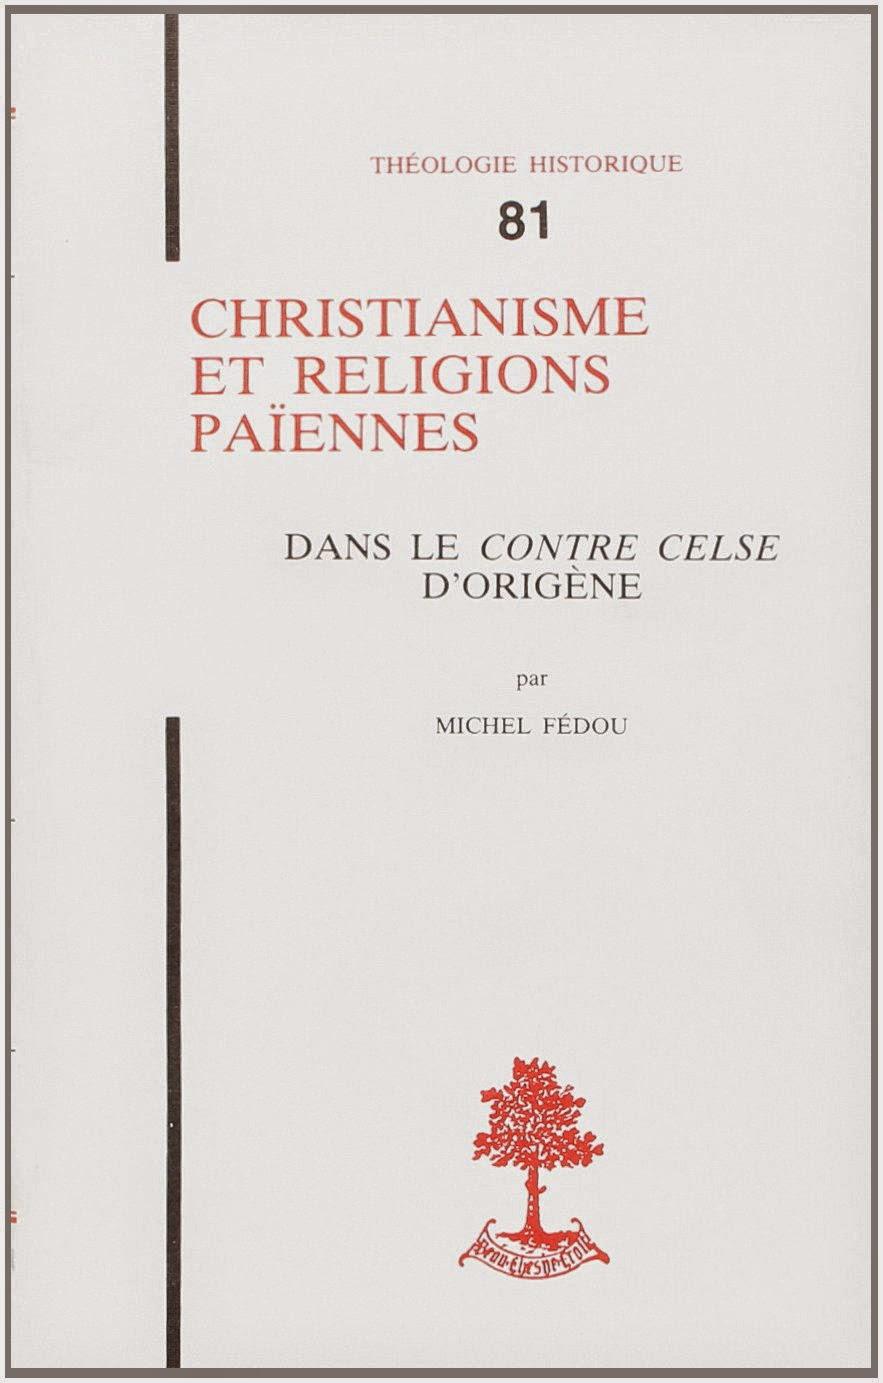 Origène éditions Beauchesne